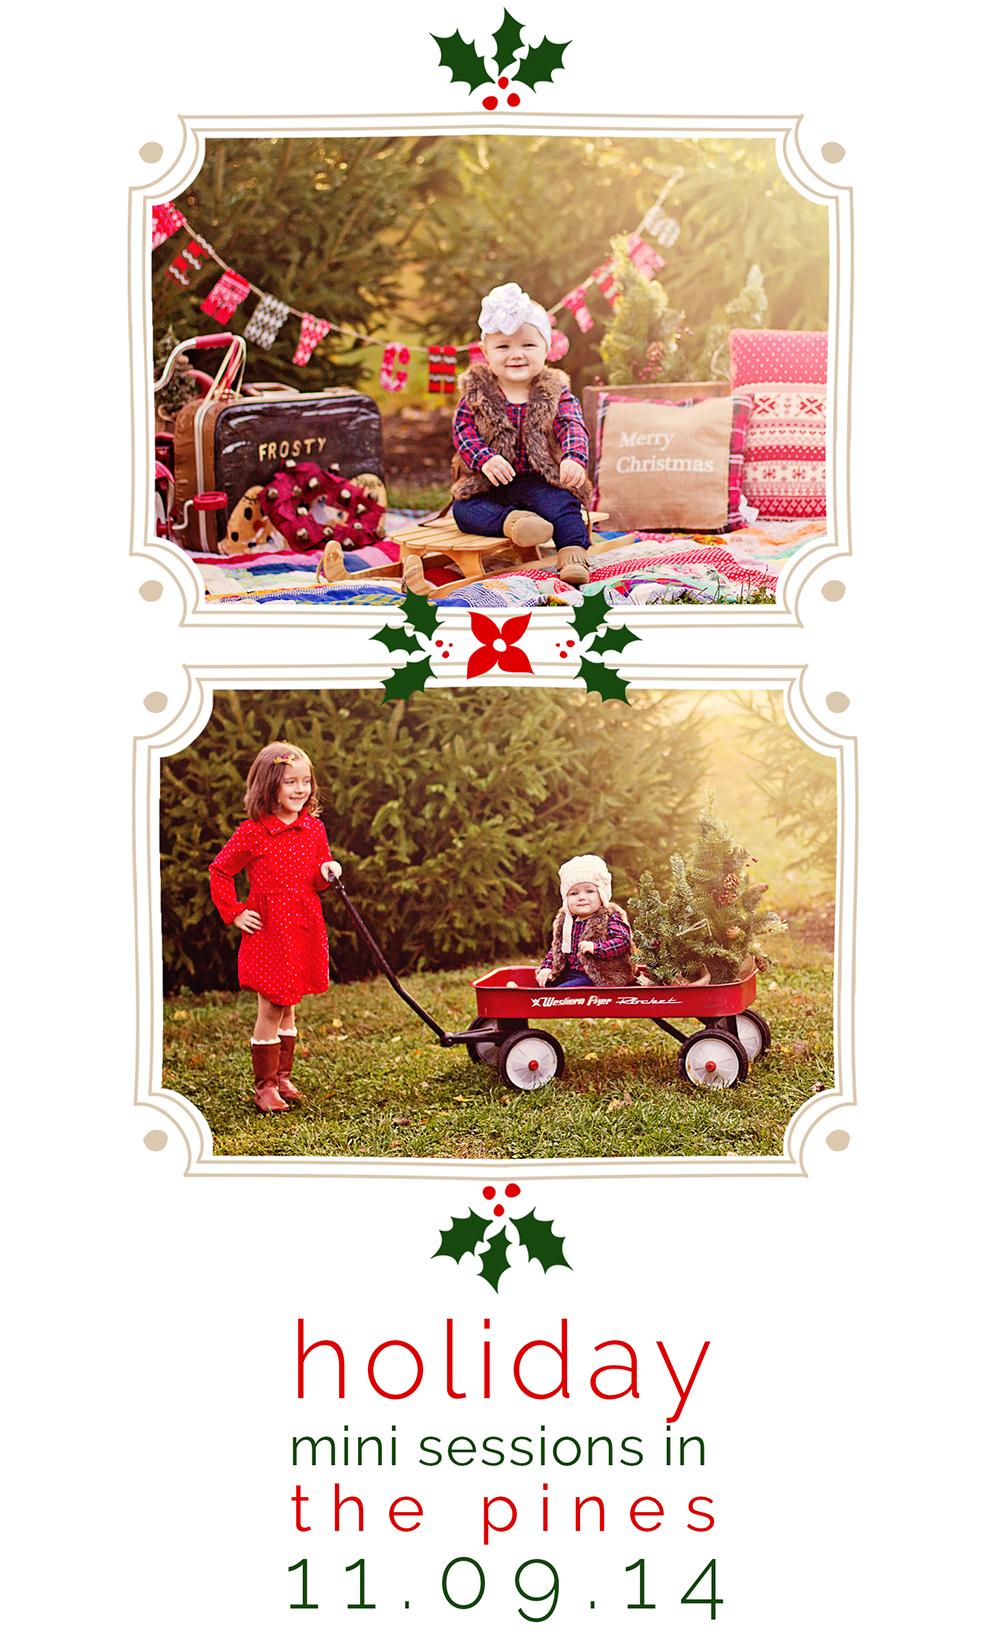 dayton ohio christmas mini sessions holiday photography 1.jpg